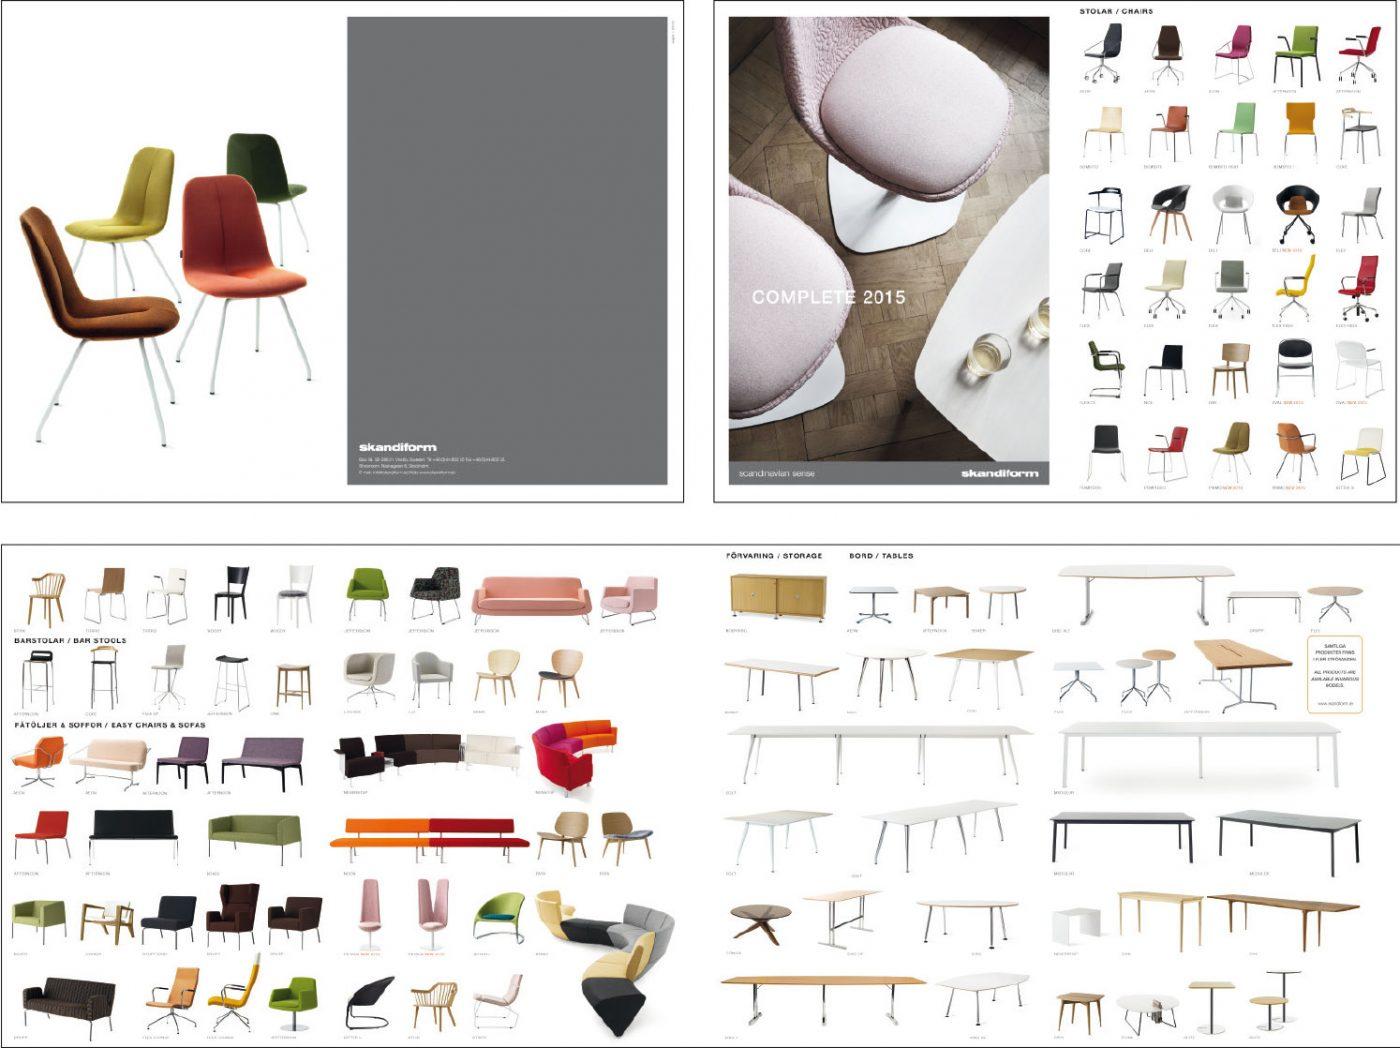 skandiform Katalog